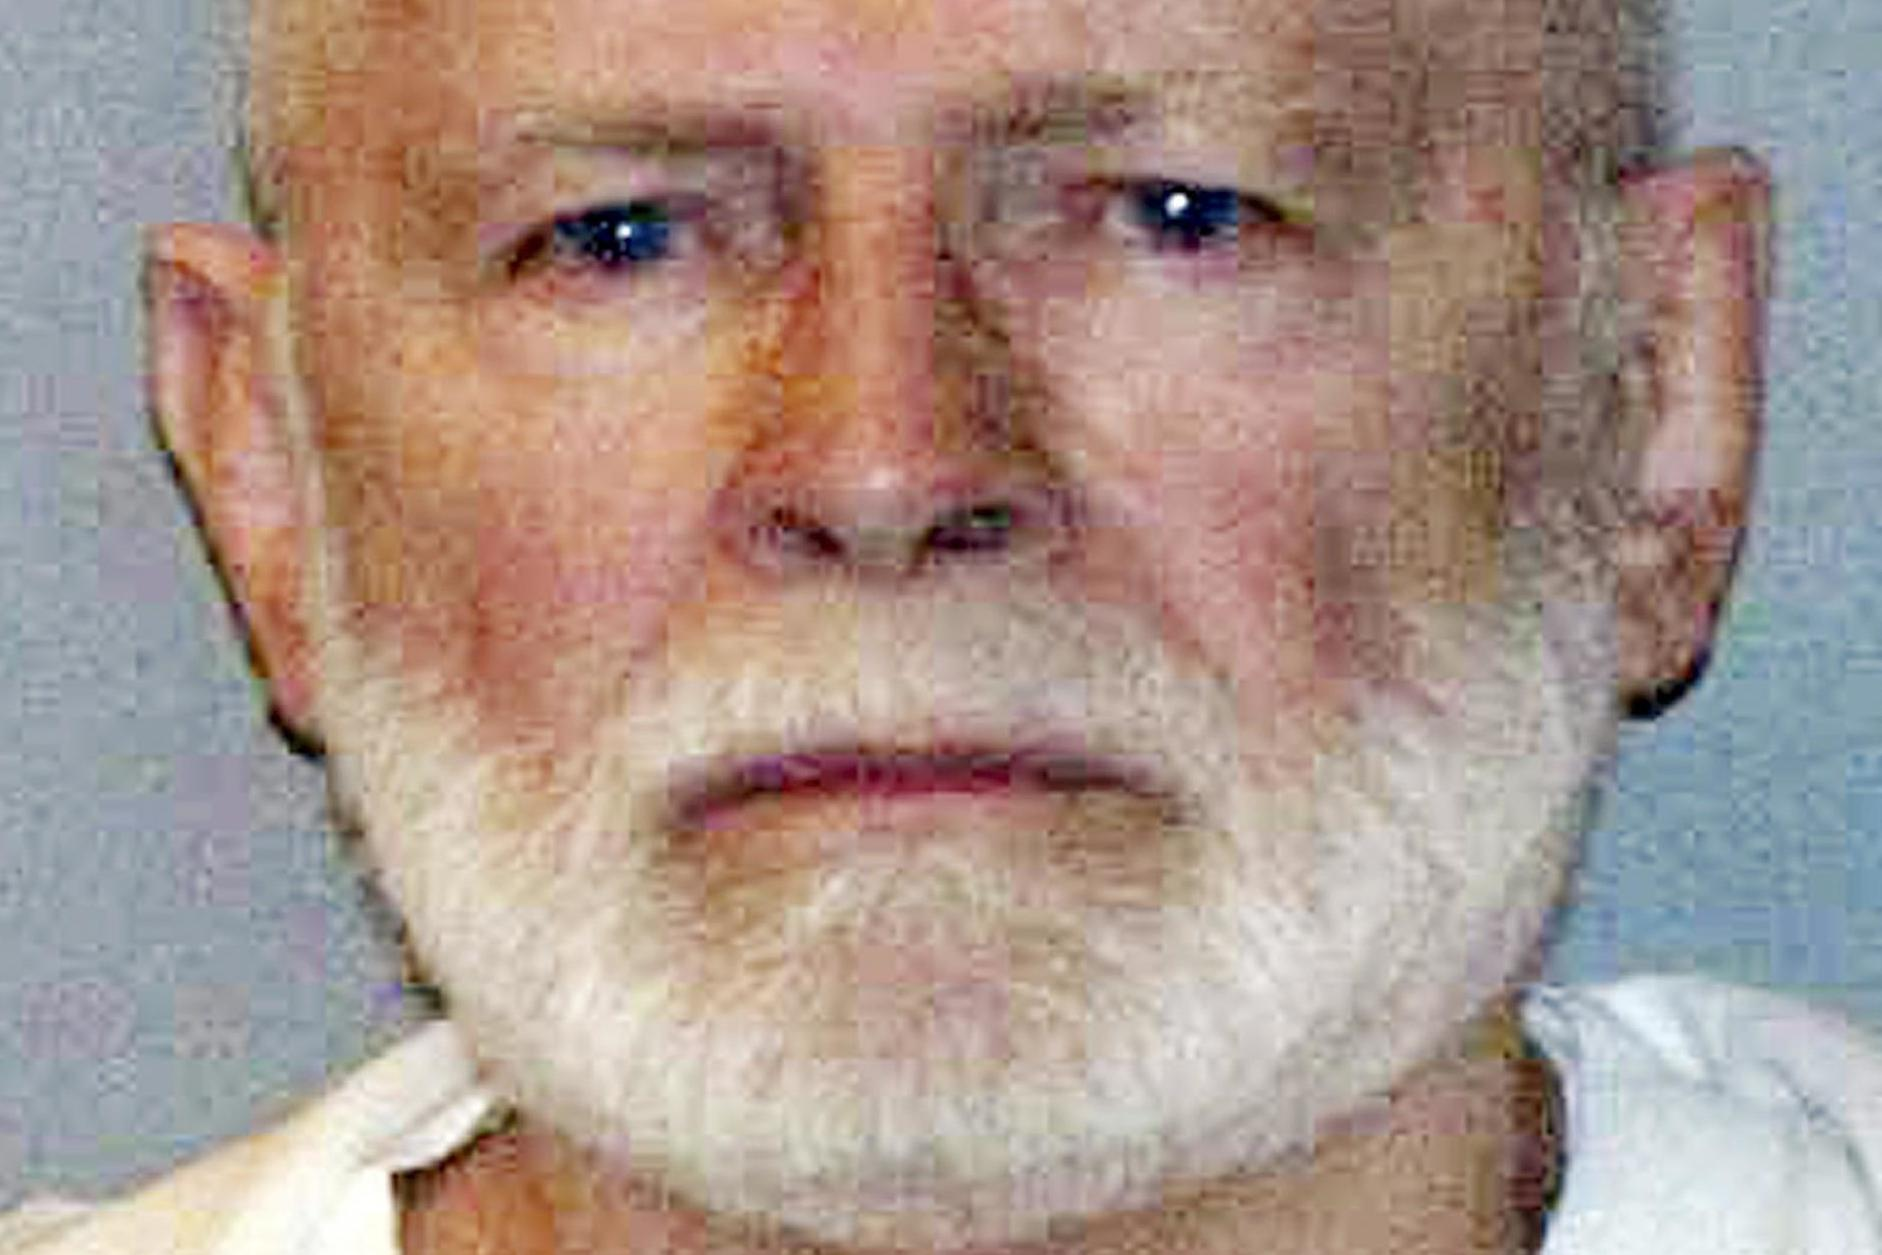 Whitey Bulger: Infamous Boston gangster killed in West Virginia jail